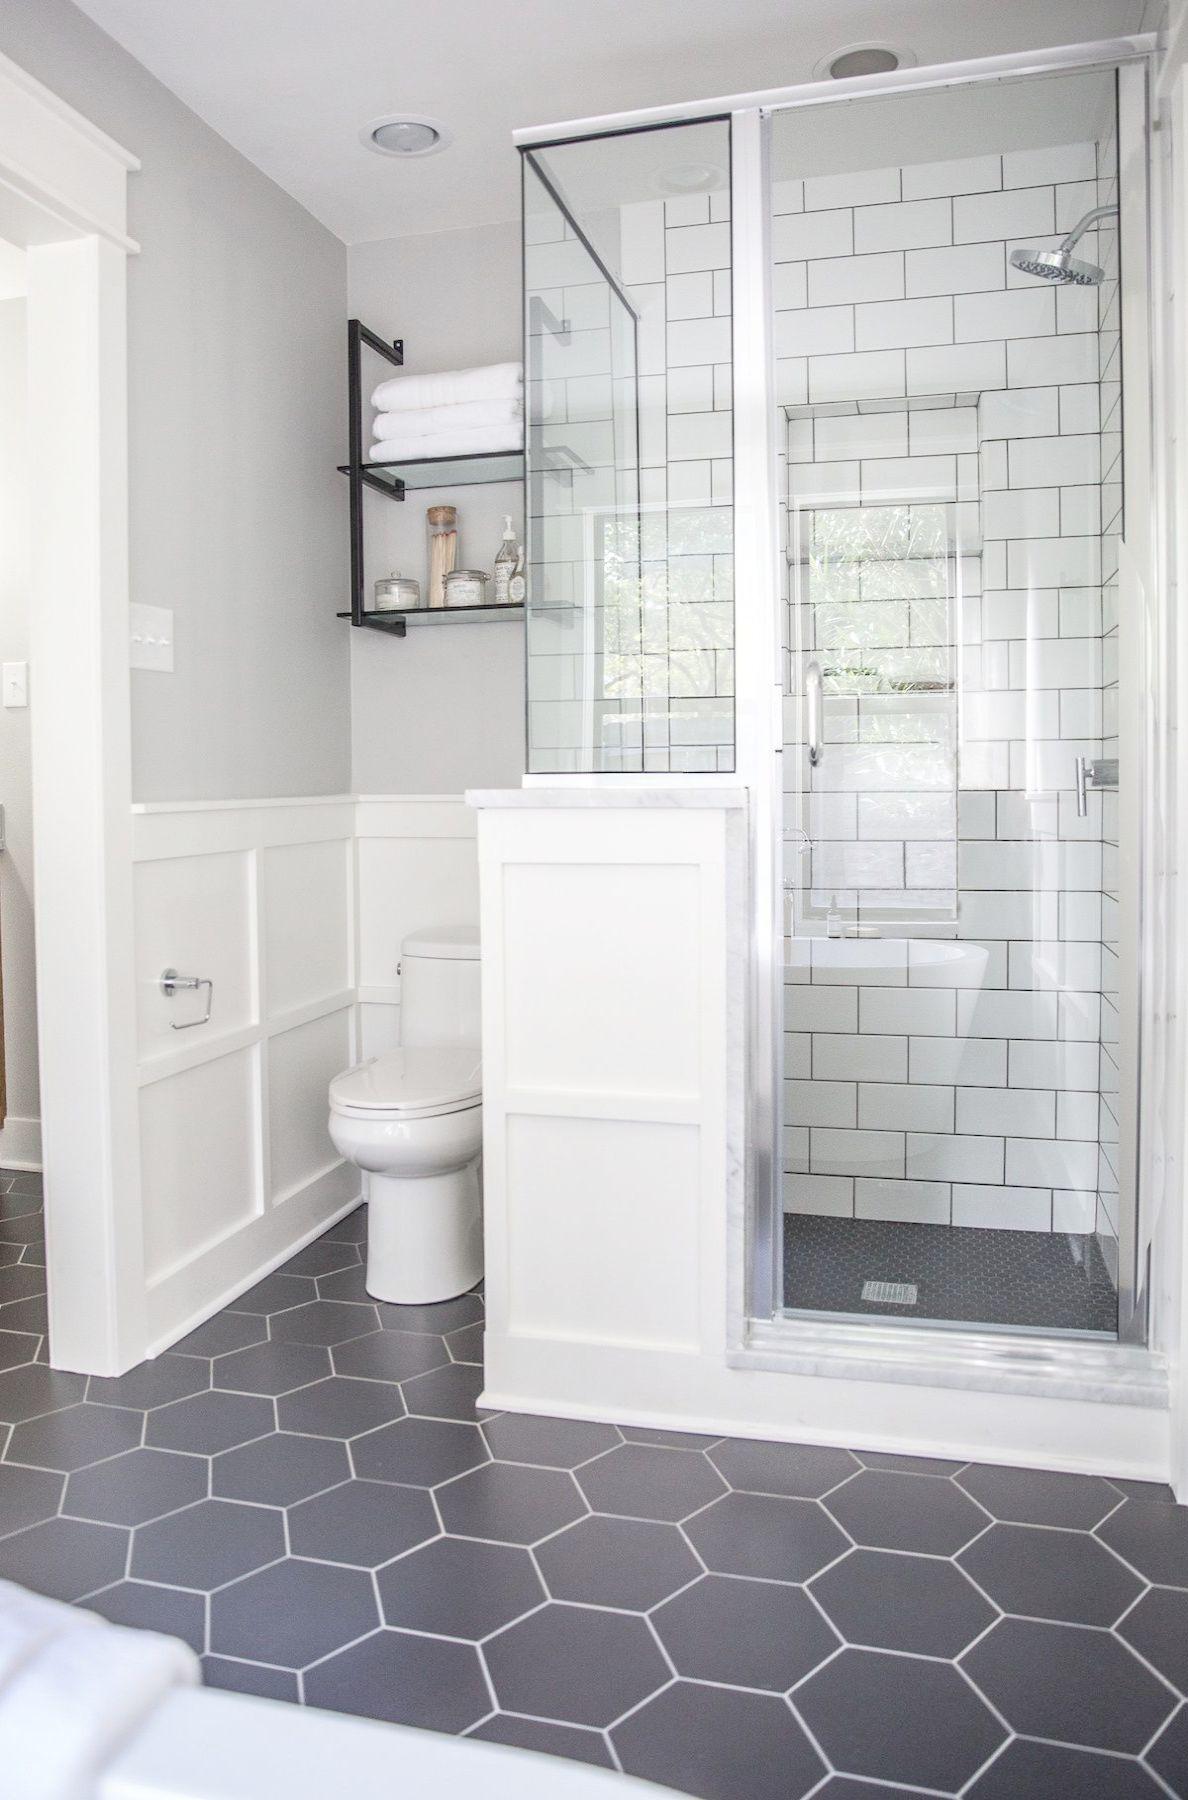 Bathroom Decor Grey And White Bathroom Ideas Homebase | Bathroom ...